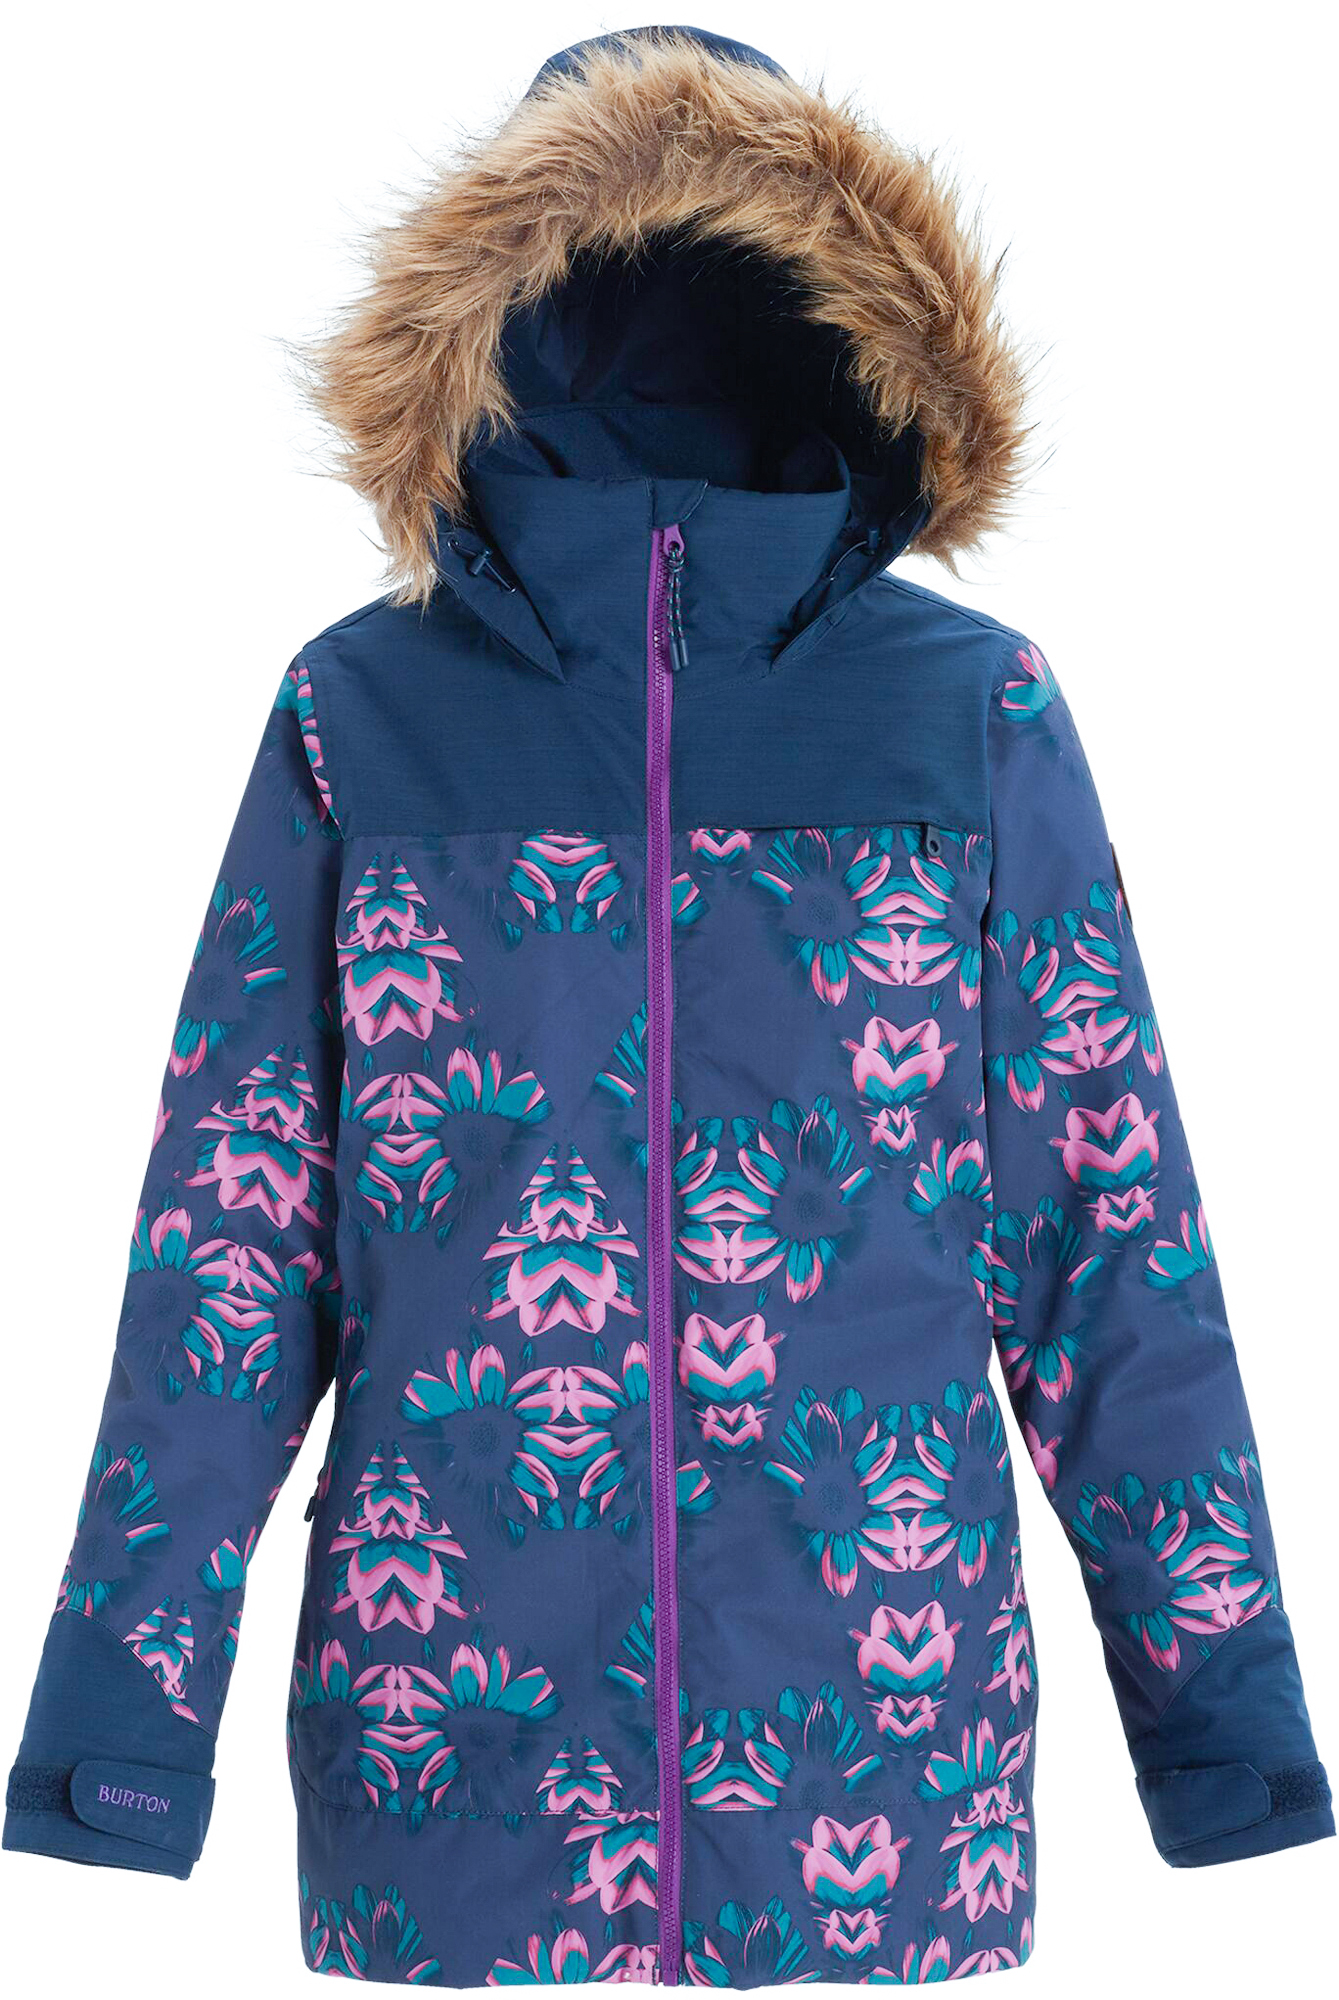 Burton Куртка утепленная женская Burton Lelah, размер 42-44 burton куртка утепленная женская burton minturn размер 48 50